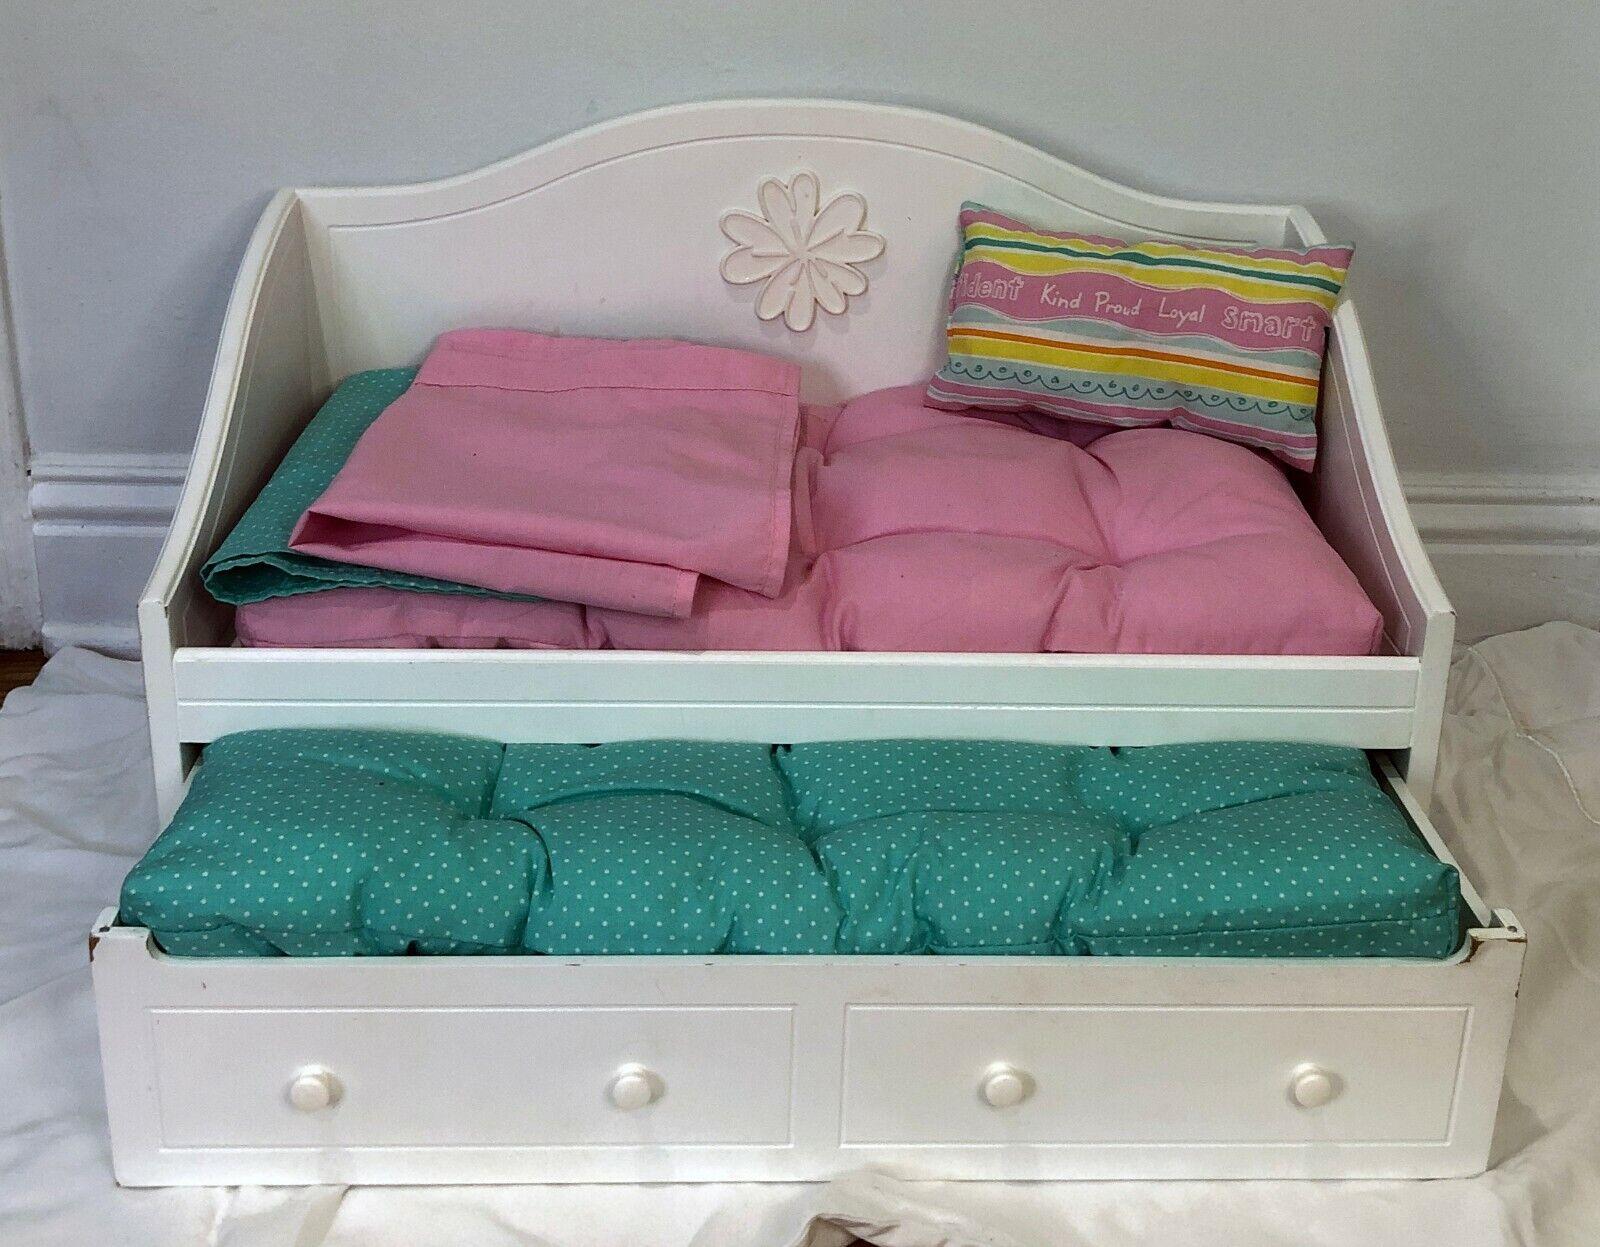 American Girl Trundle Bed Bedding Set For 18 Dolls - $30.00